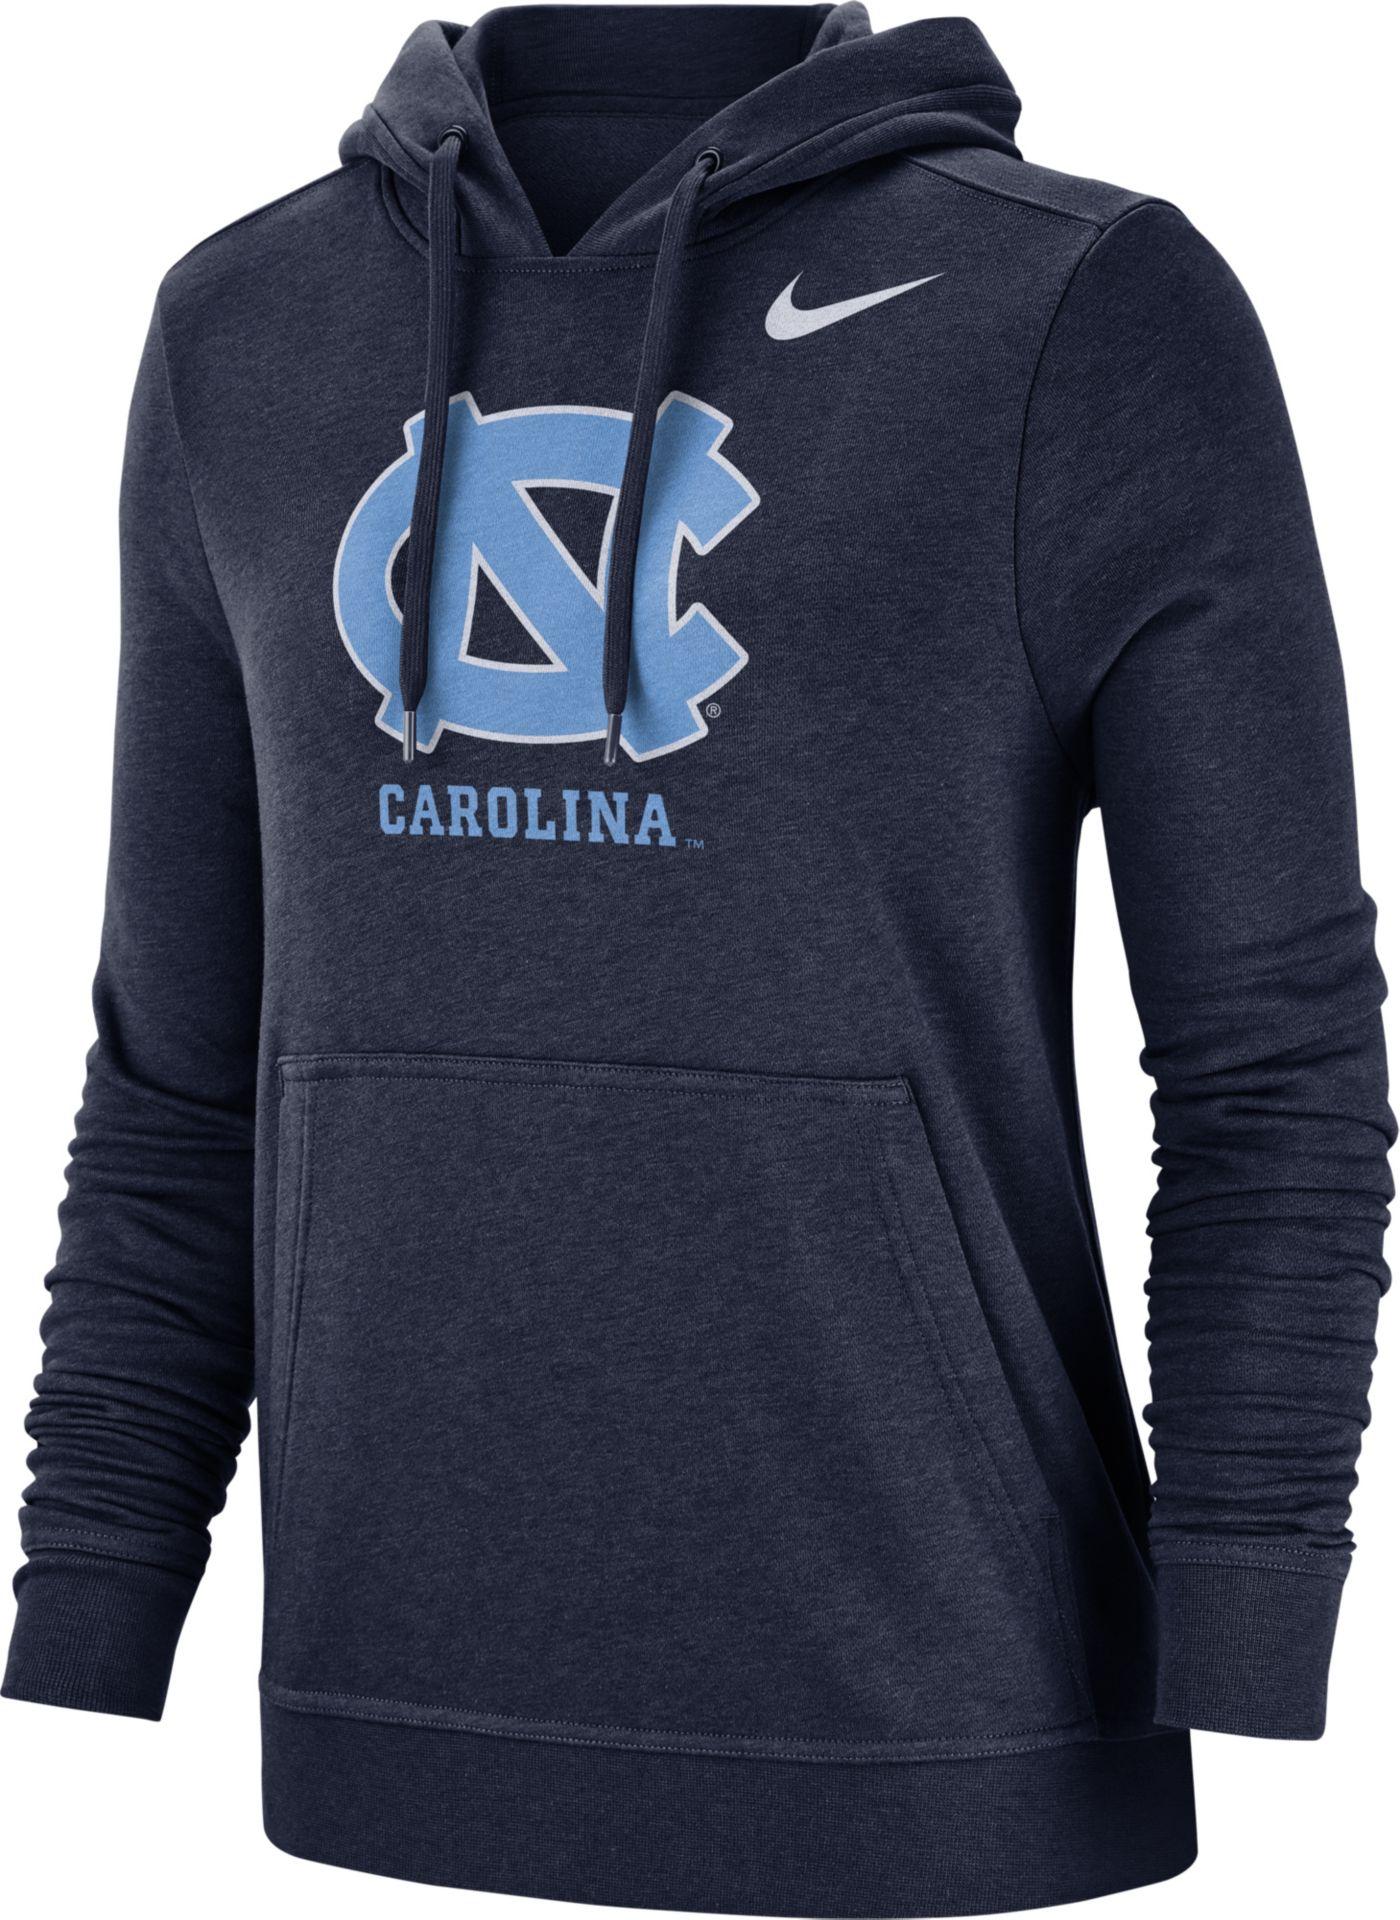 Nike Women's North Carolina Tar Heels Navy Club Fleece Pullover Hoodie